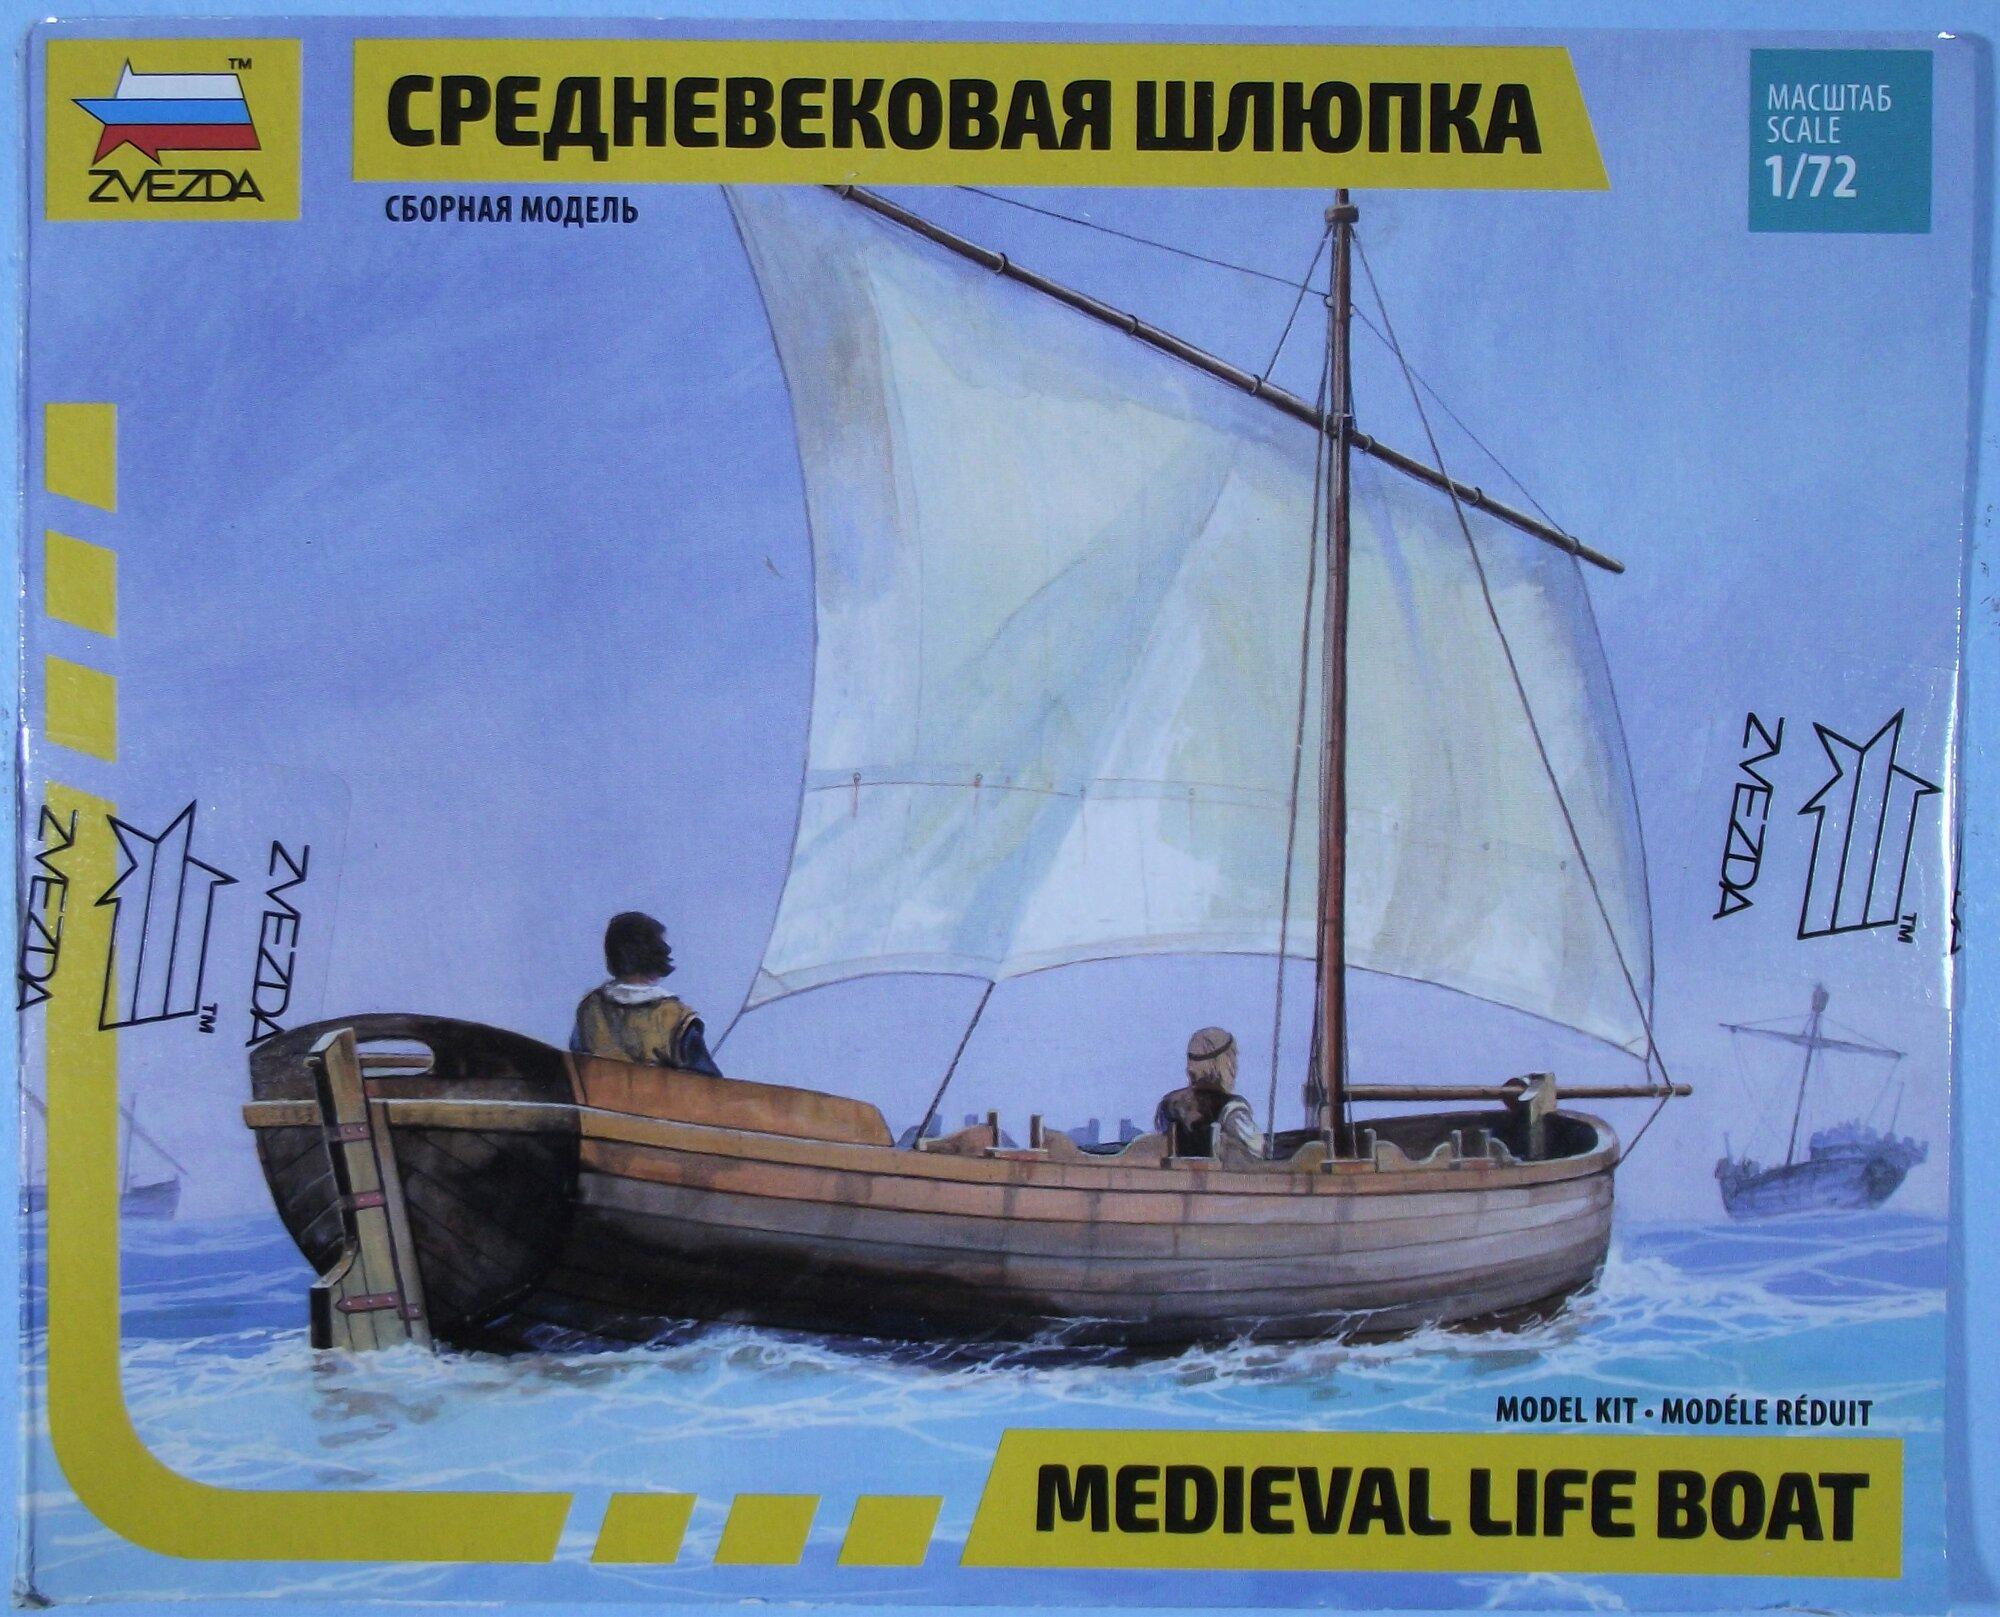 Boat_04-23-2021 (1).jpg